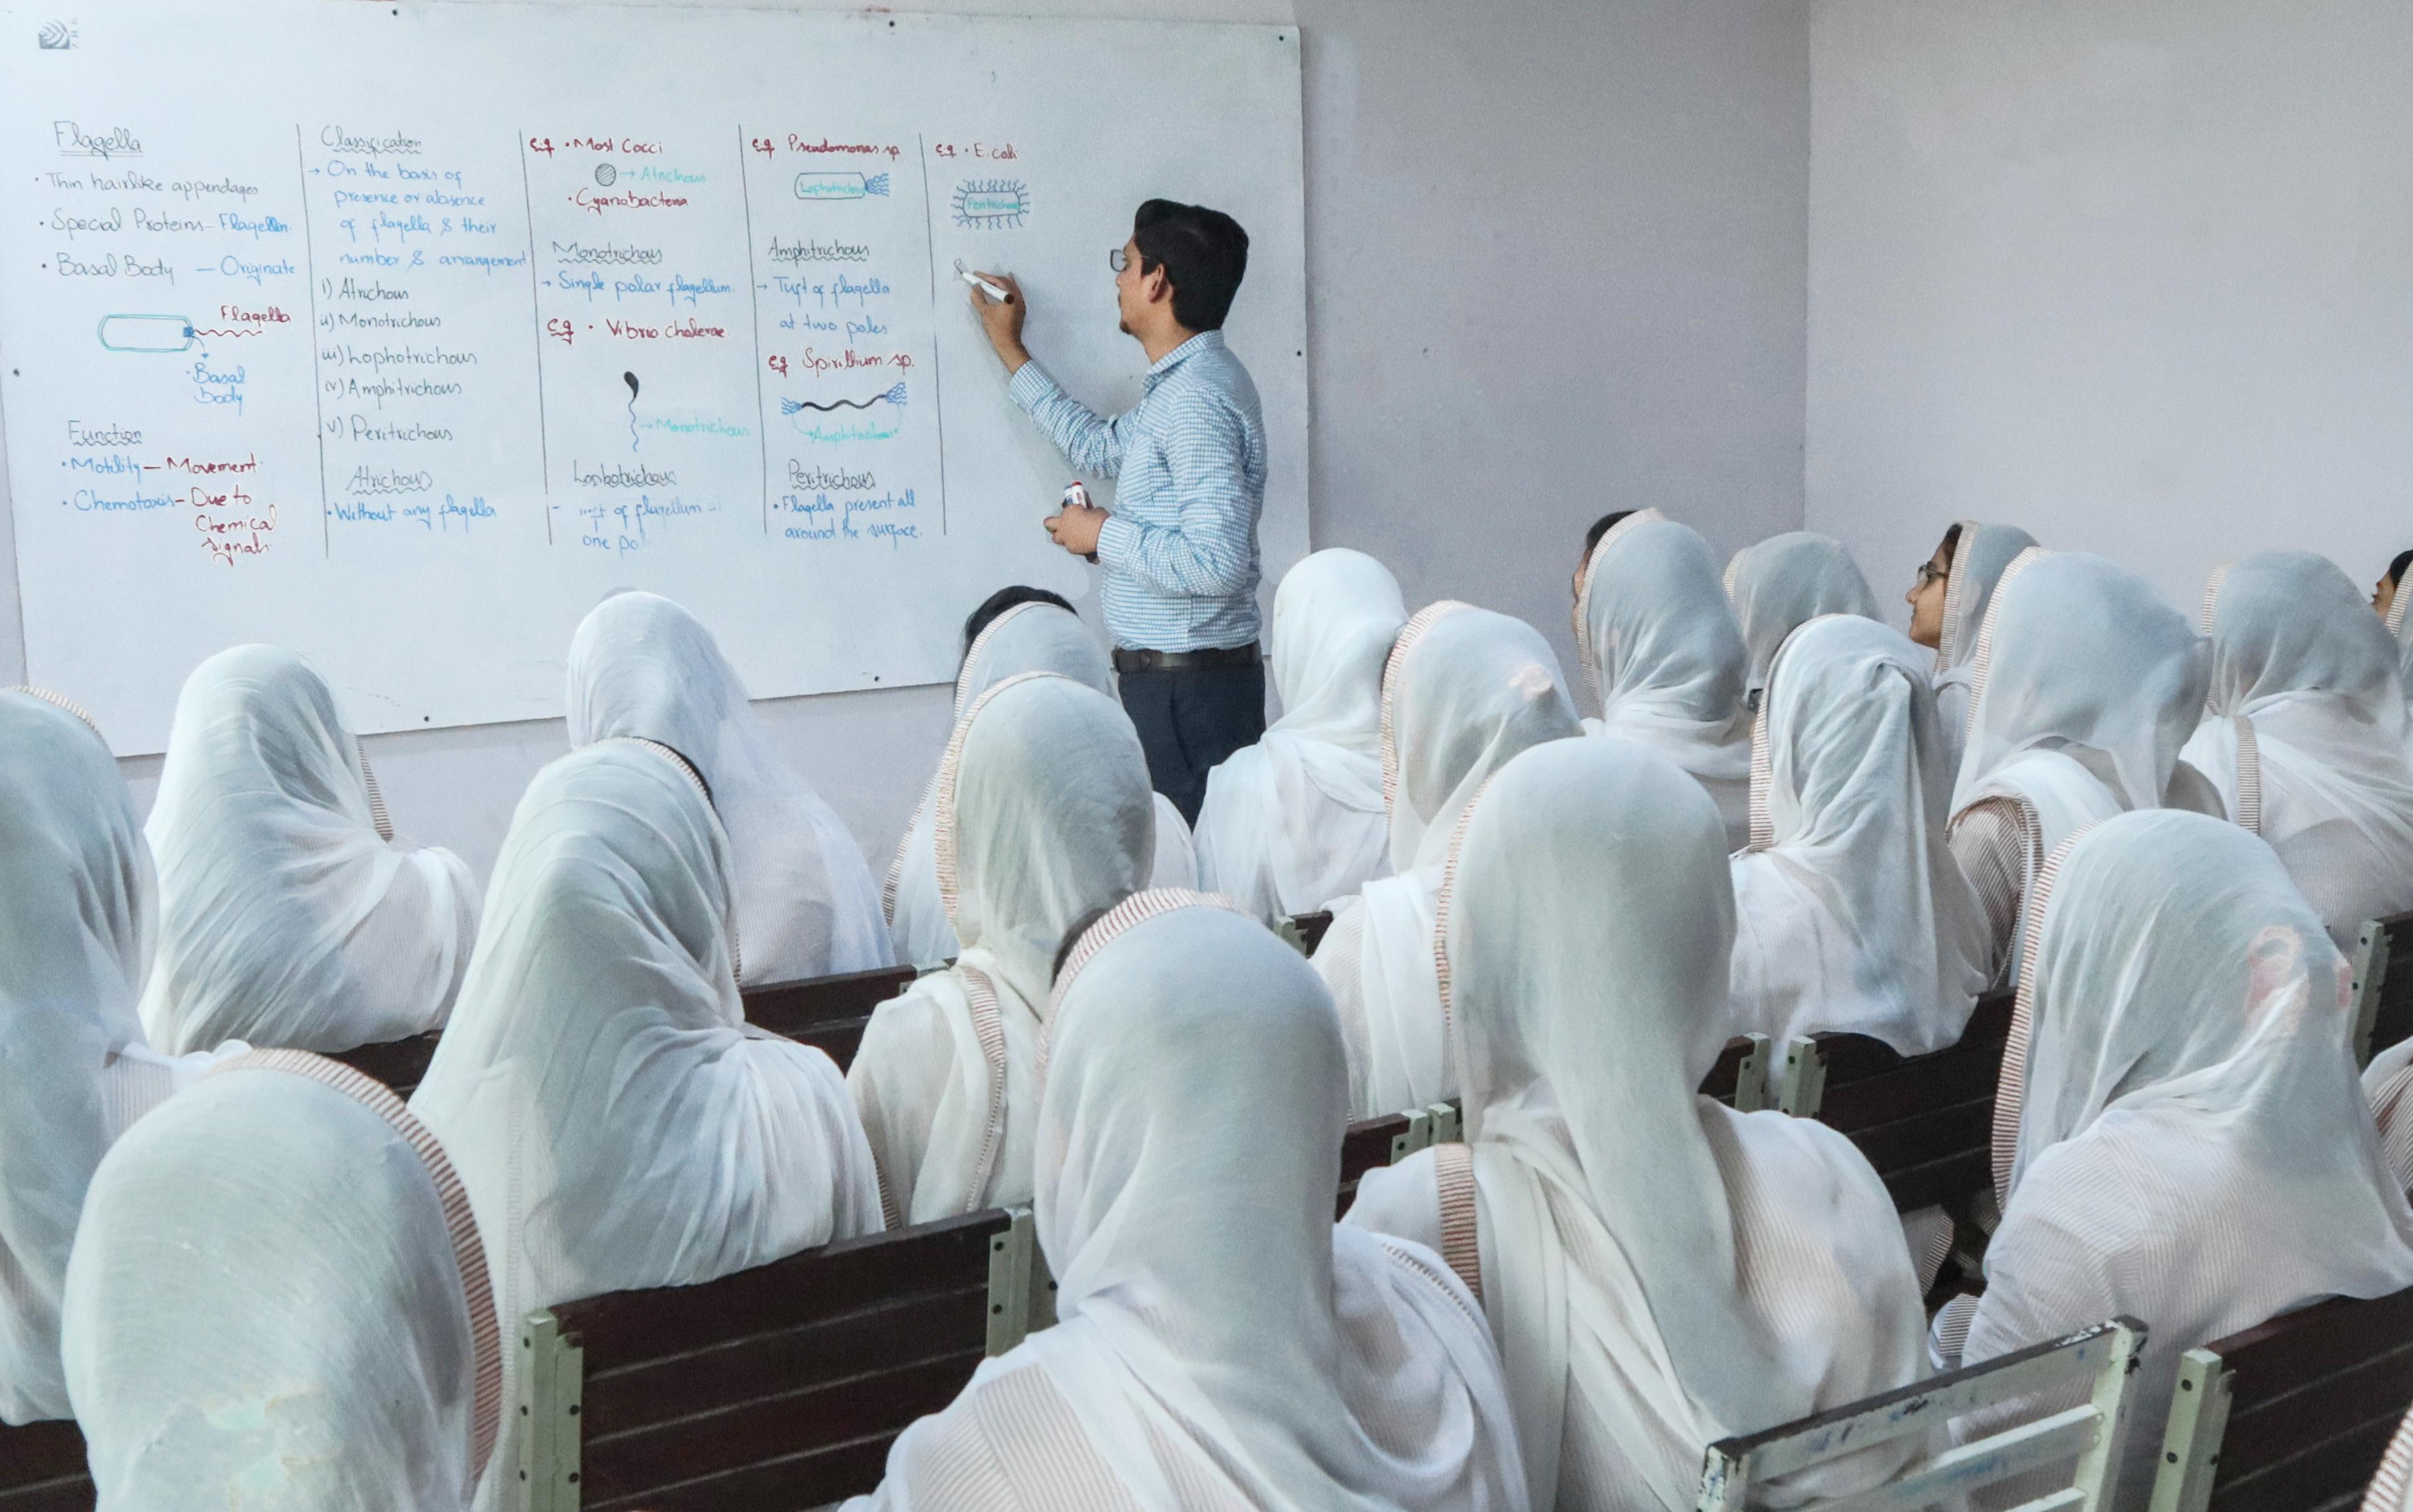 Al-Noorian High School - Shakargarh Campus